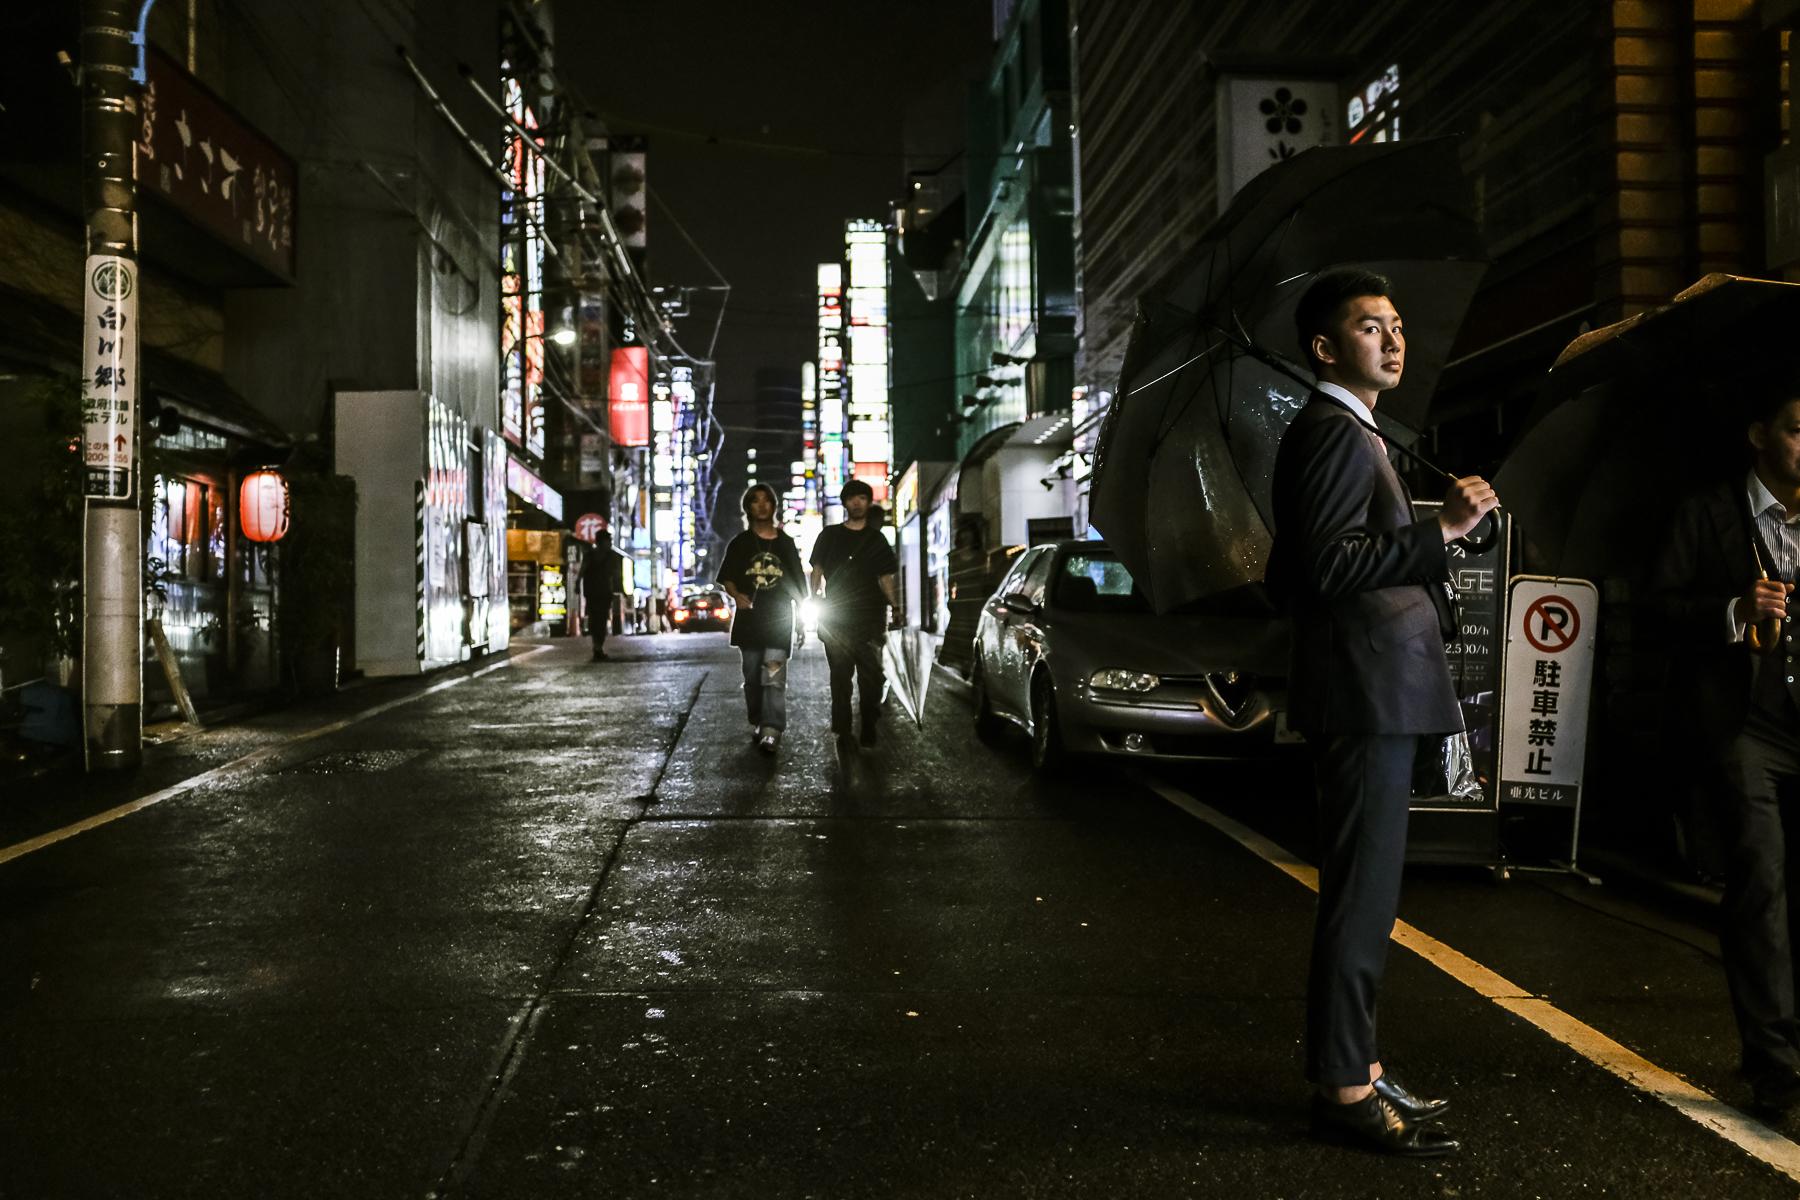 NIGHT TOKYO, JAPON // ZARAGOZA WALKERS